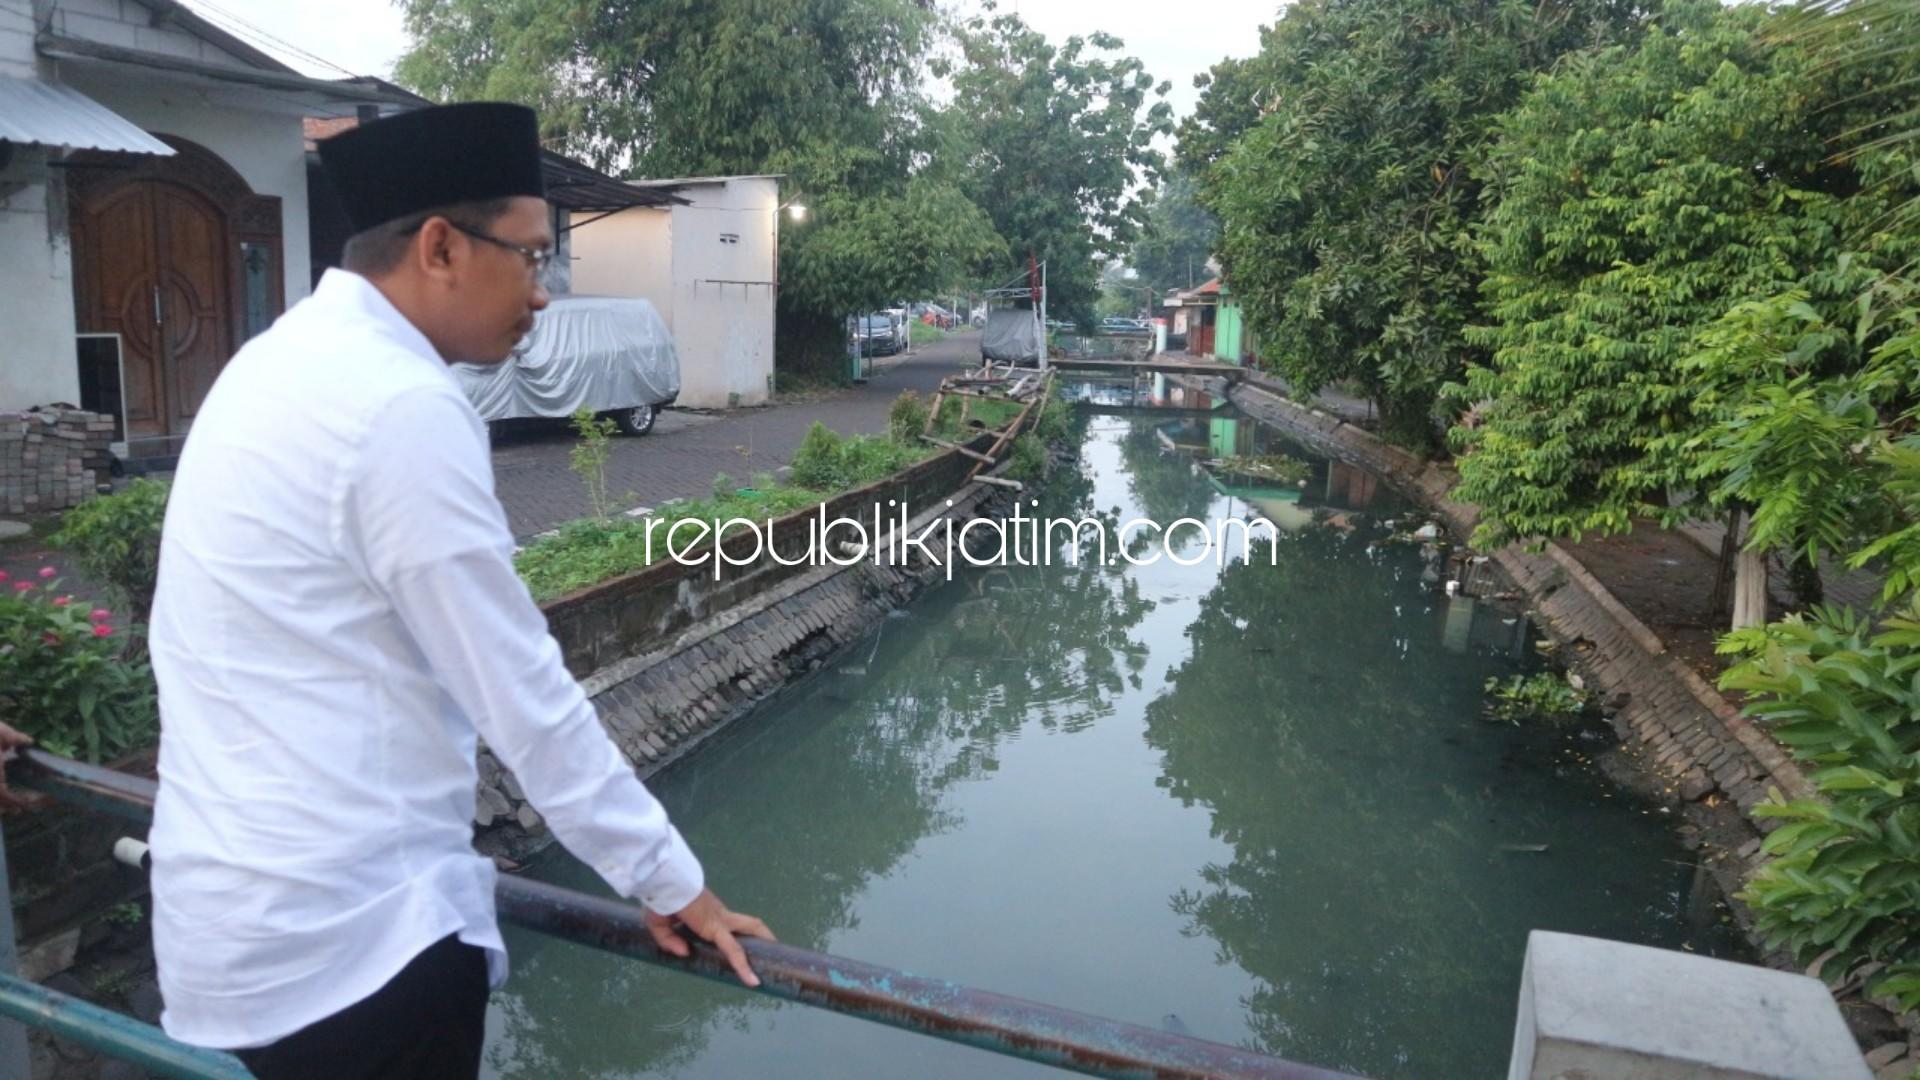 Atasi Banjir di Sidoarjo, Gus Muhdlor Bakal Revitalisasi Sungai dan Bangun RTH